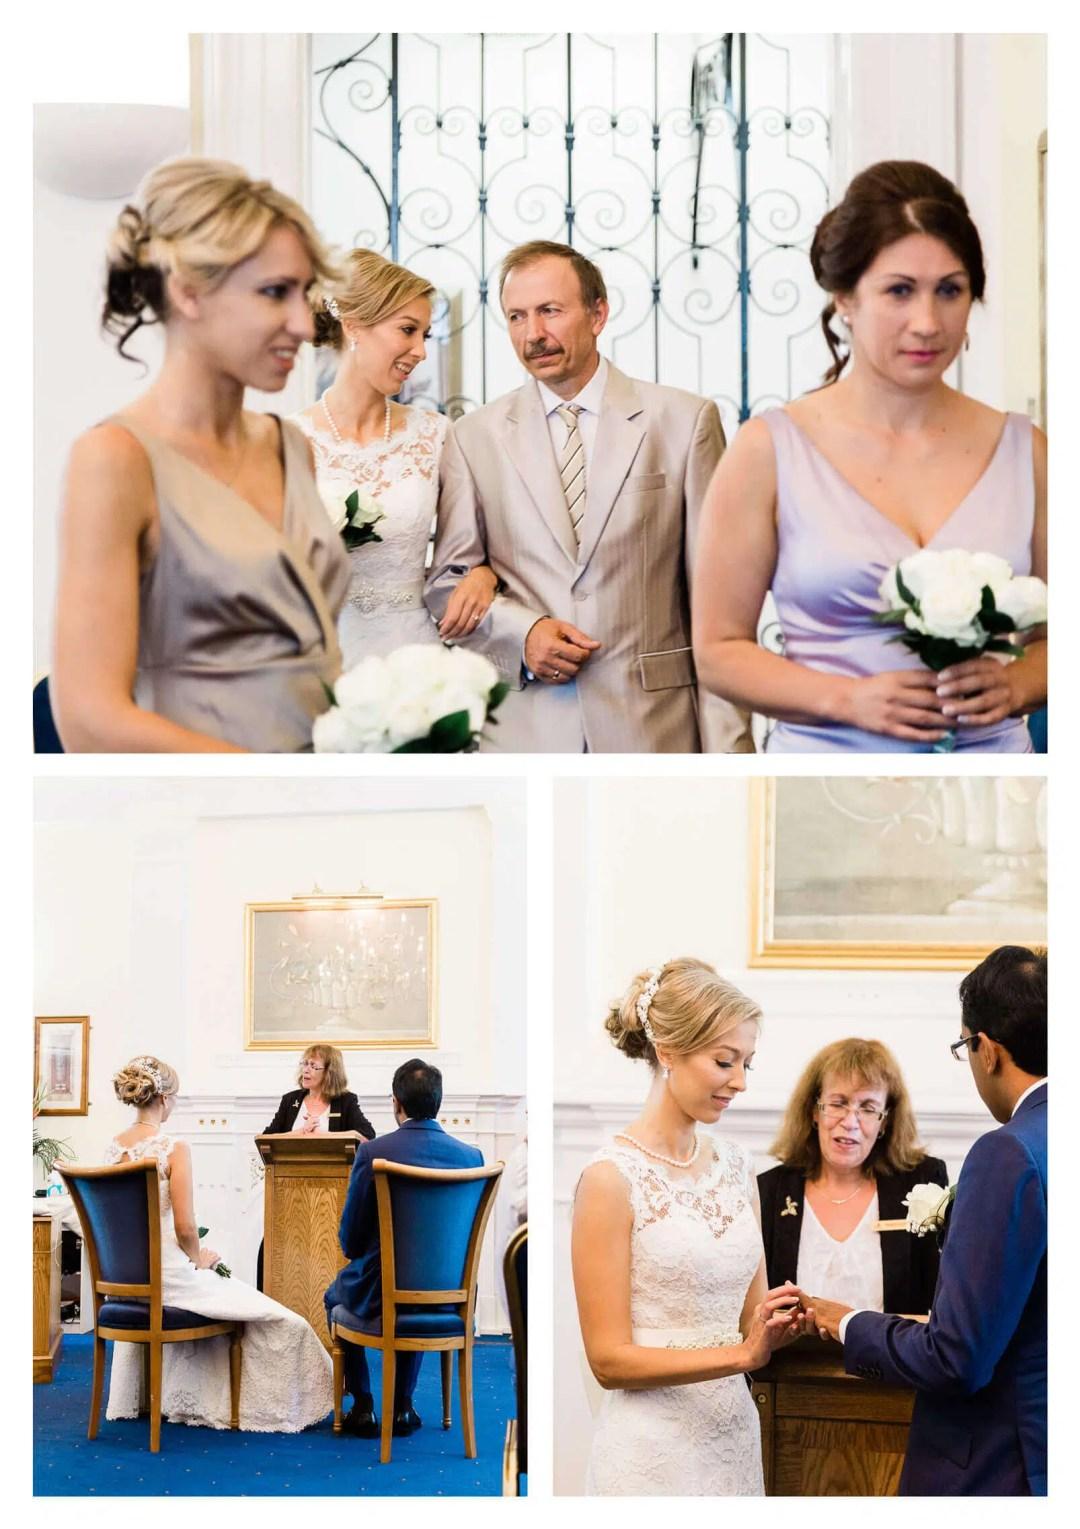 Bromley Public Hall registry wedding ceremony | London photographer